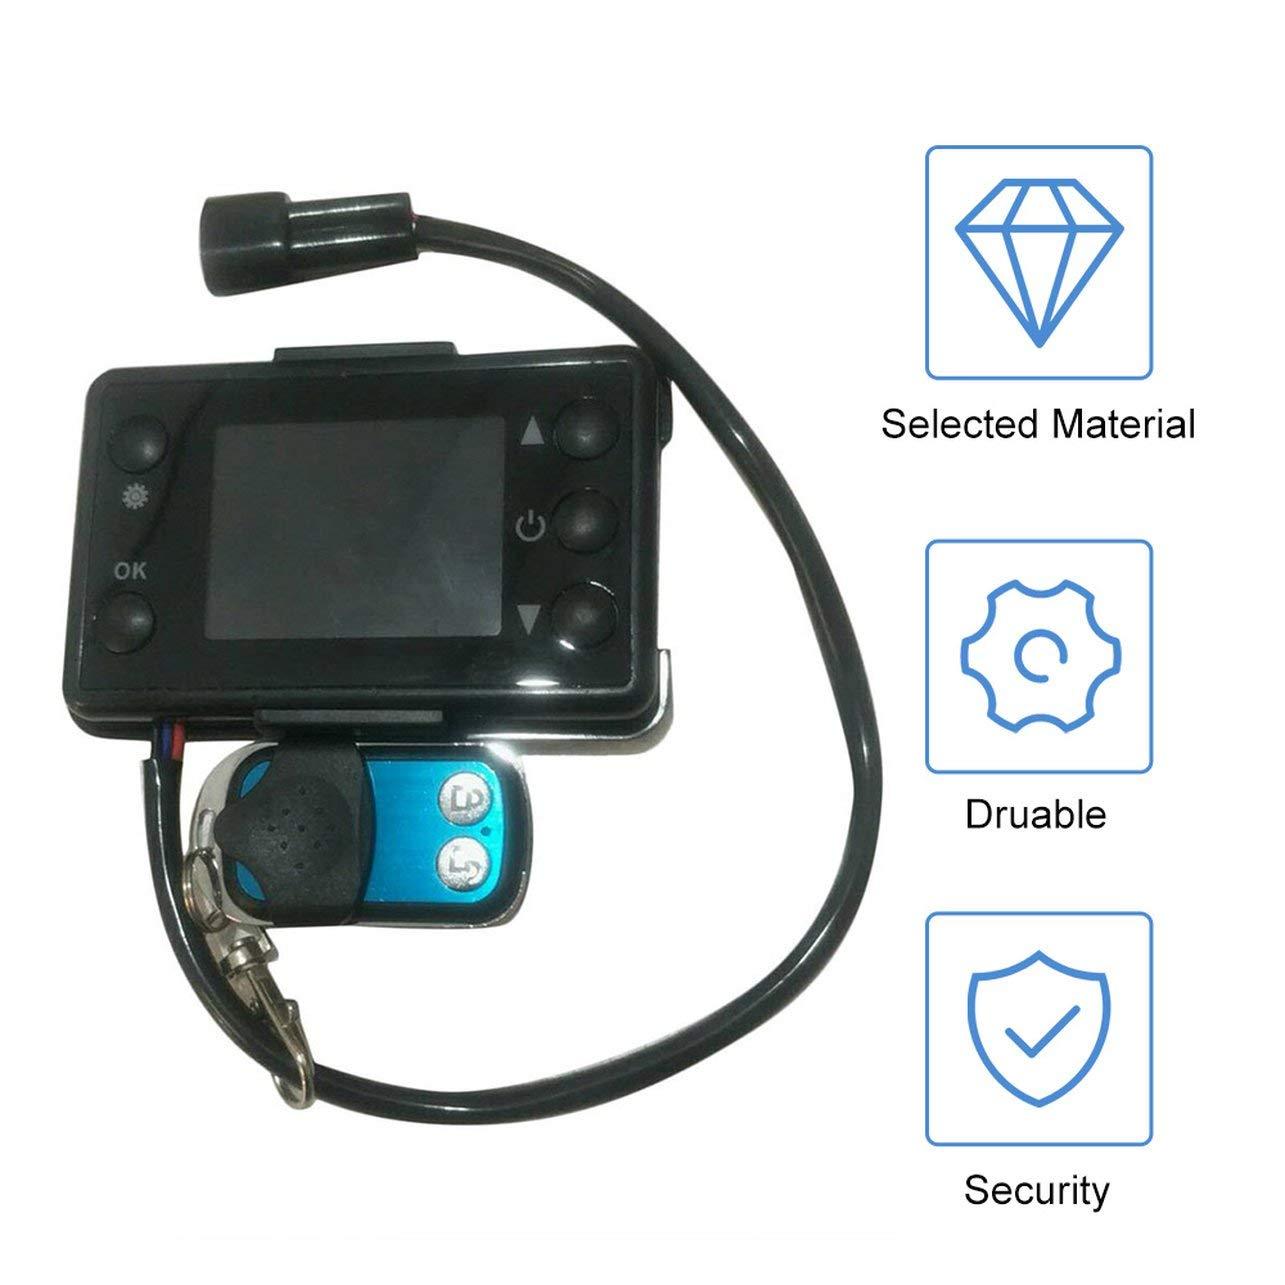 5KW universale per riscaldatore ad aria per pista 24V 3 WOSOYES/® Regolatore per riscaldatore di parcheggio per monitor riscaldatore per auto monitor LCD 12V